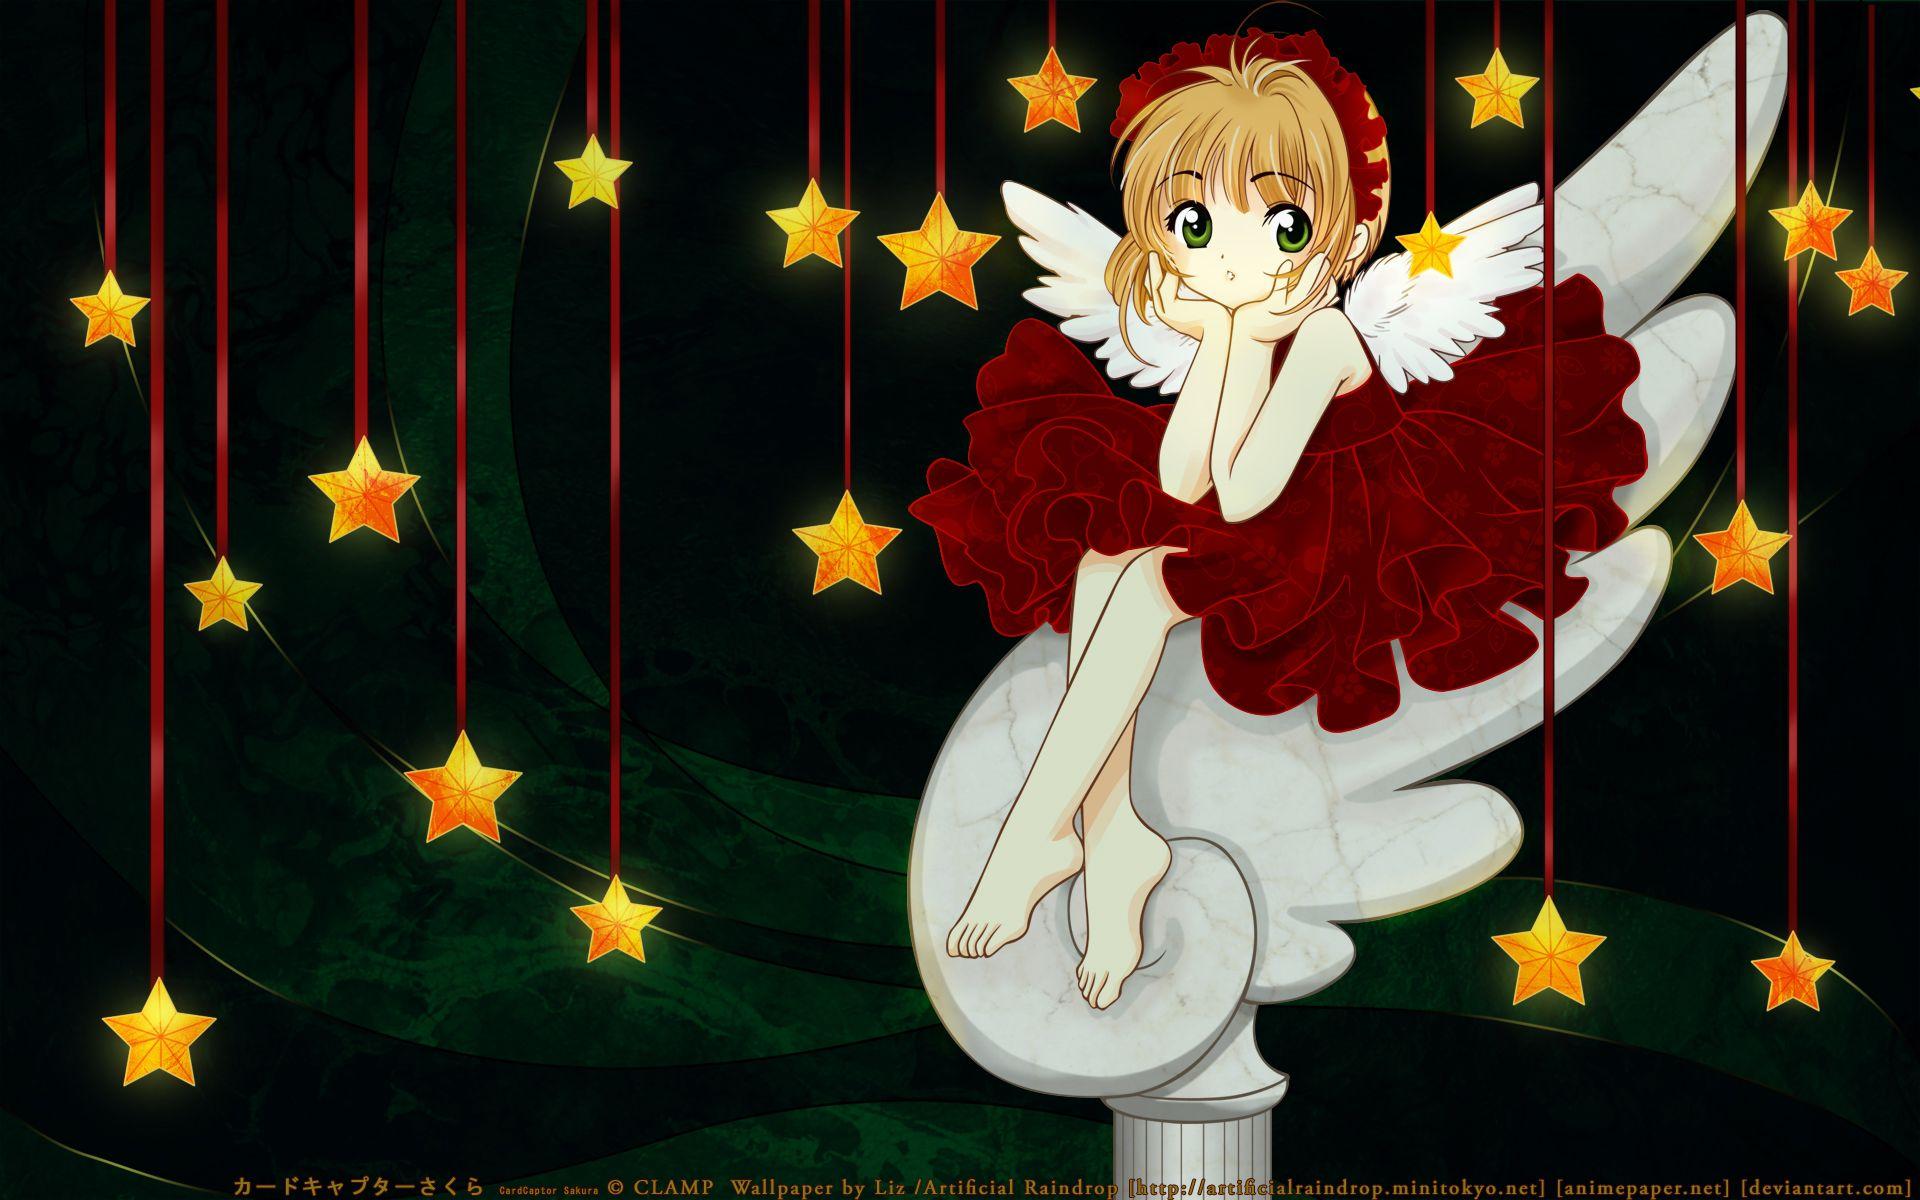 10 Download Anime Card Captor Sakura Wallpapers In 2021 Anime Cardcaptor Sakura Sakura